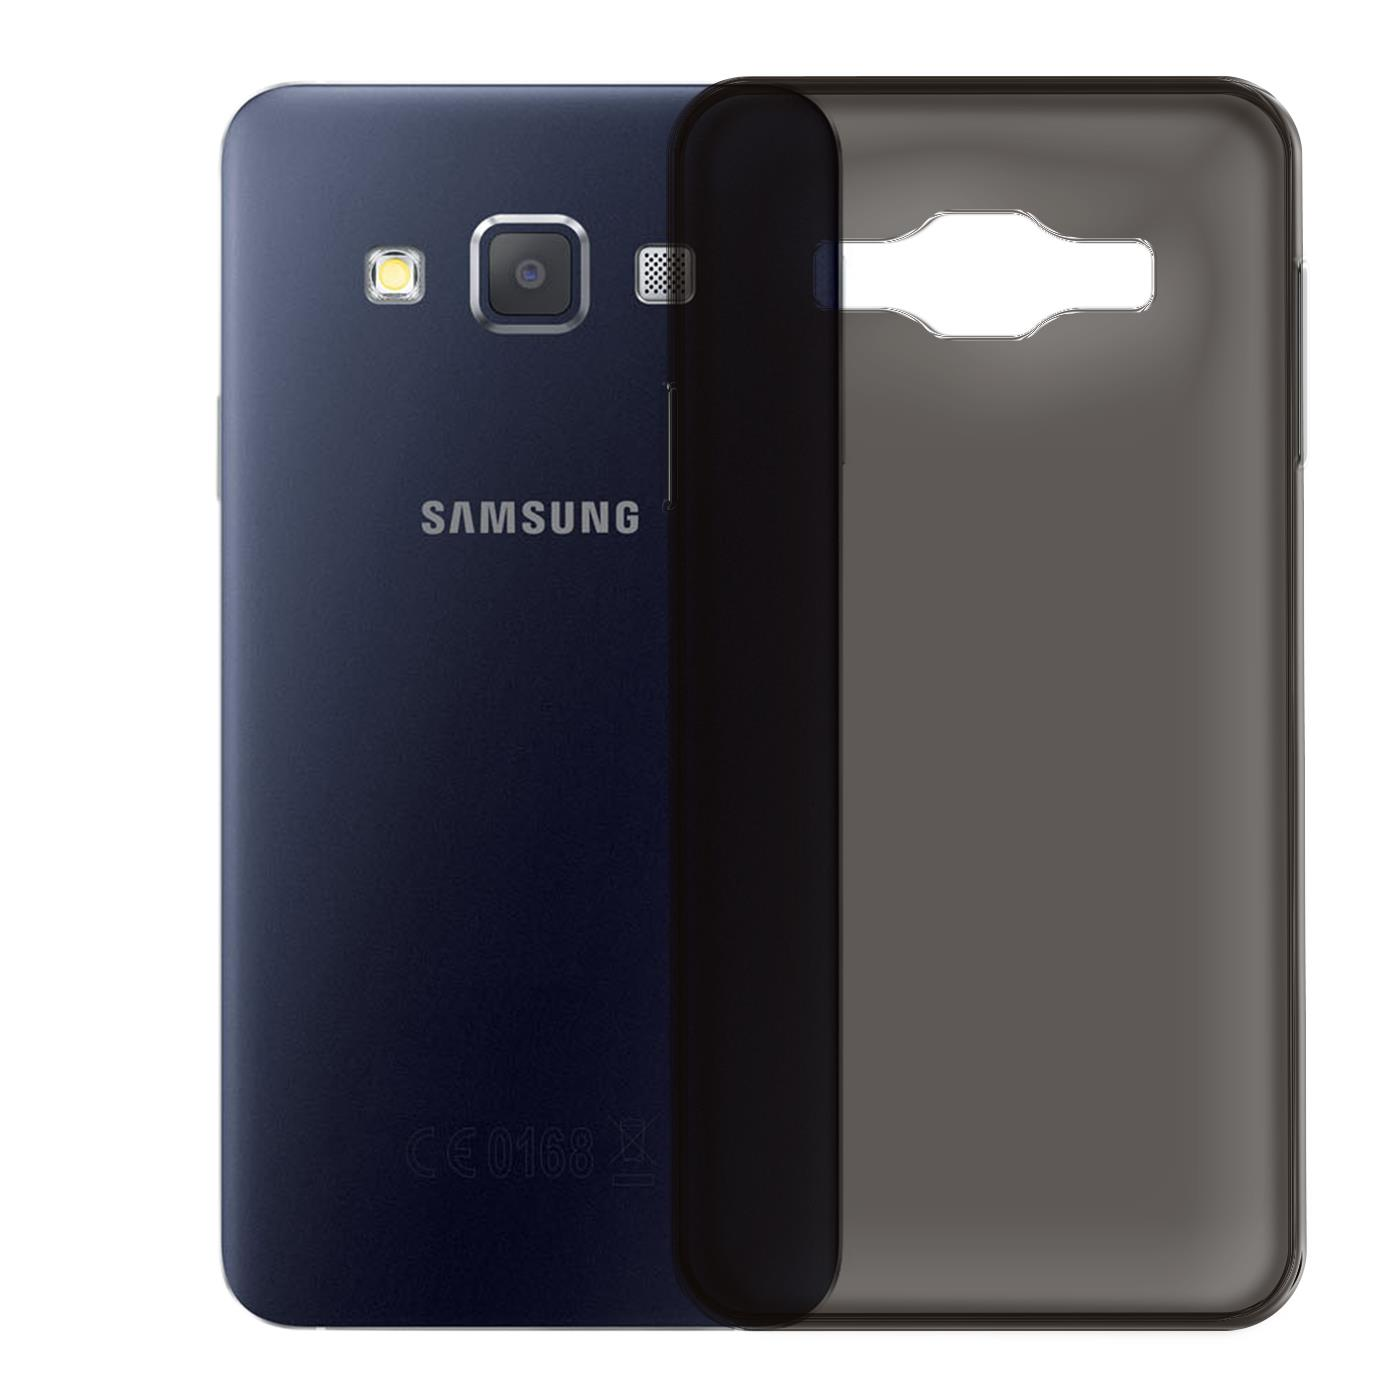 Samsung-Galaxy-A3-2015-Thin-Silicone-Clear-Case-Cover-Ultra-Slim-Shockproof-Gel Indexbild 26